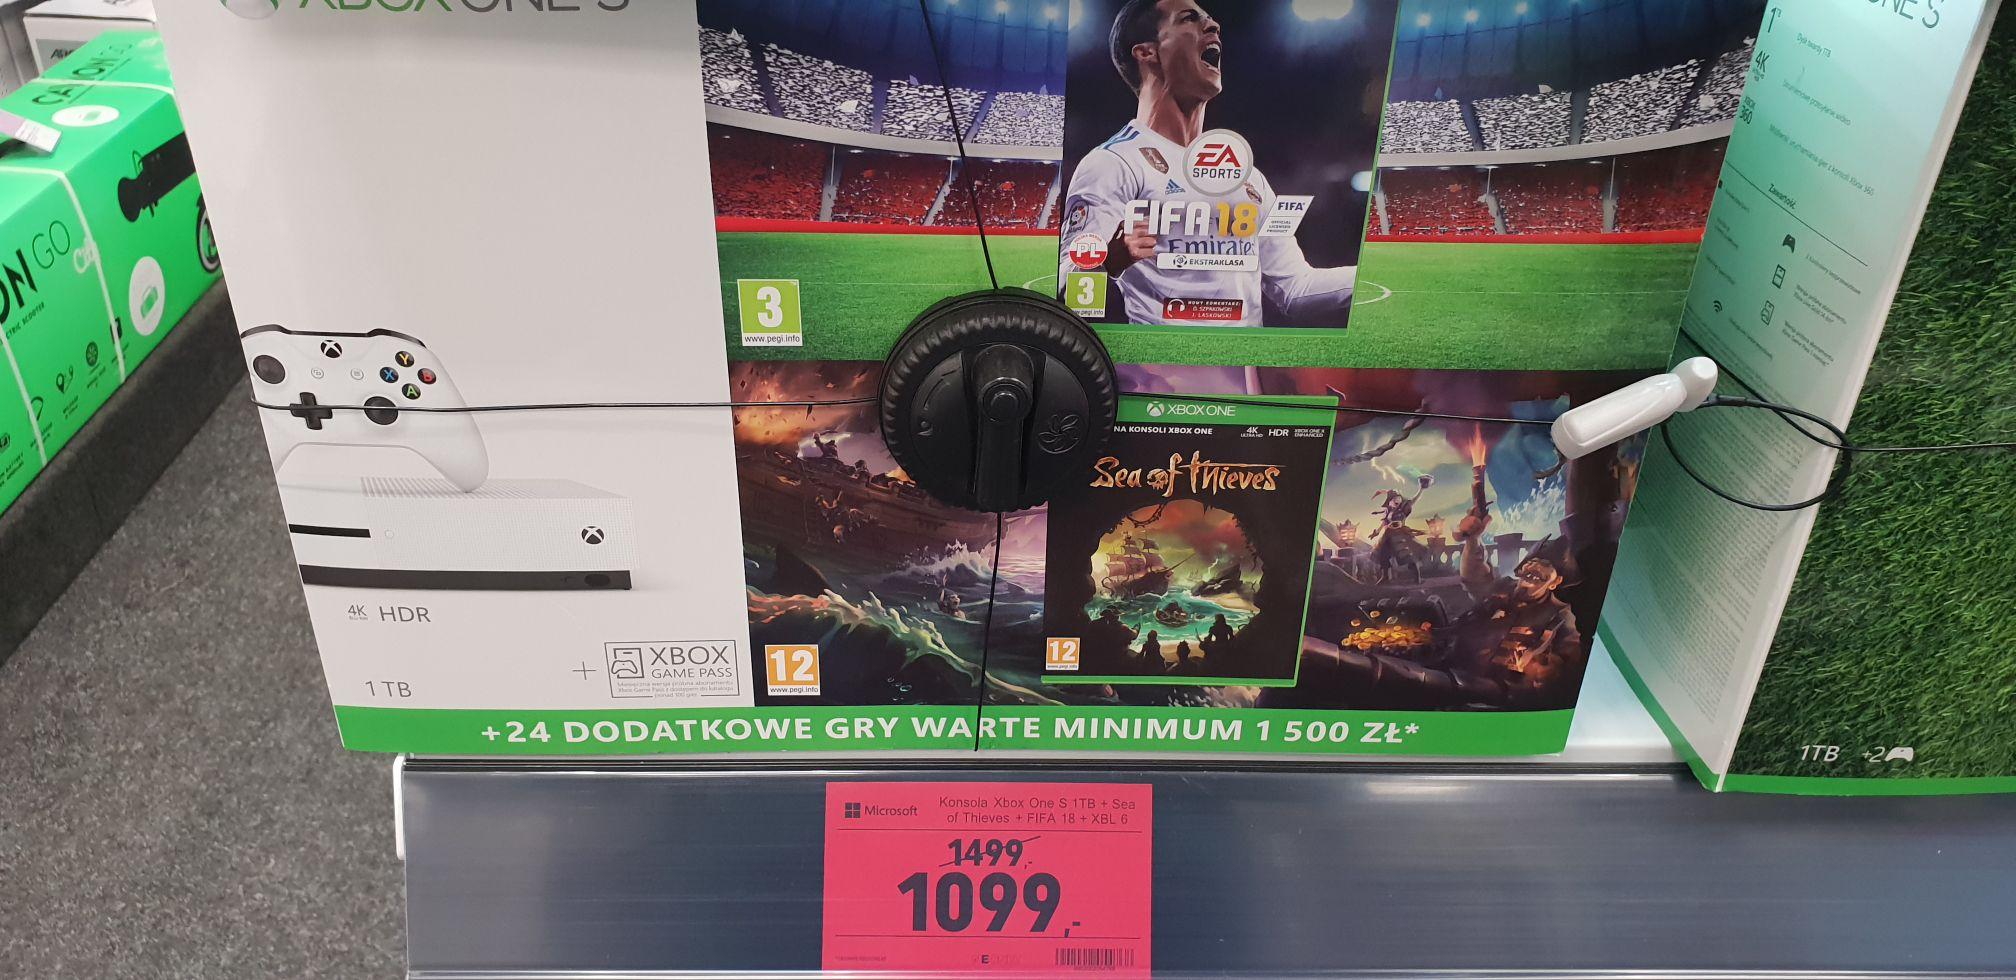 Konsola Xbox One S 1TB + Fifa 18 + Sea of Thieves + XBL 6 mc - Neonet Bytom